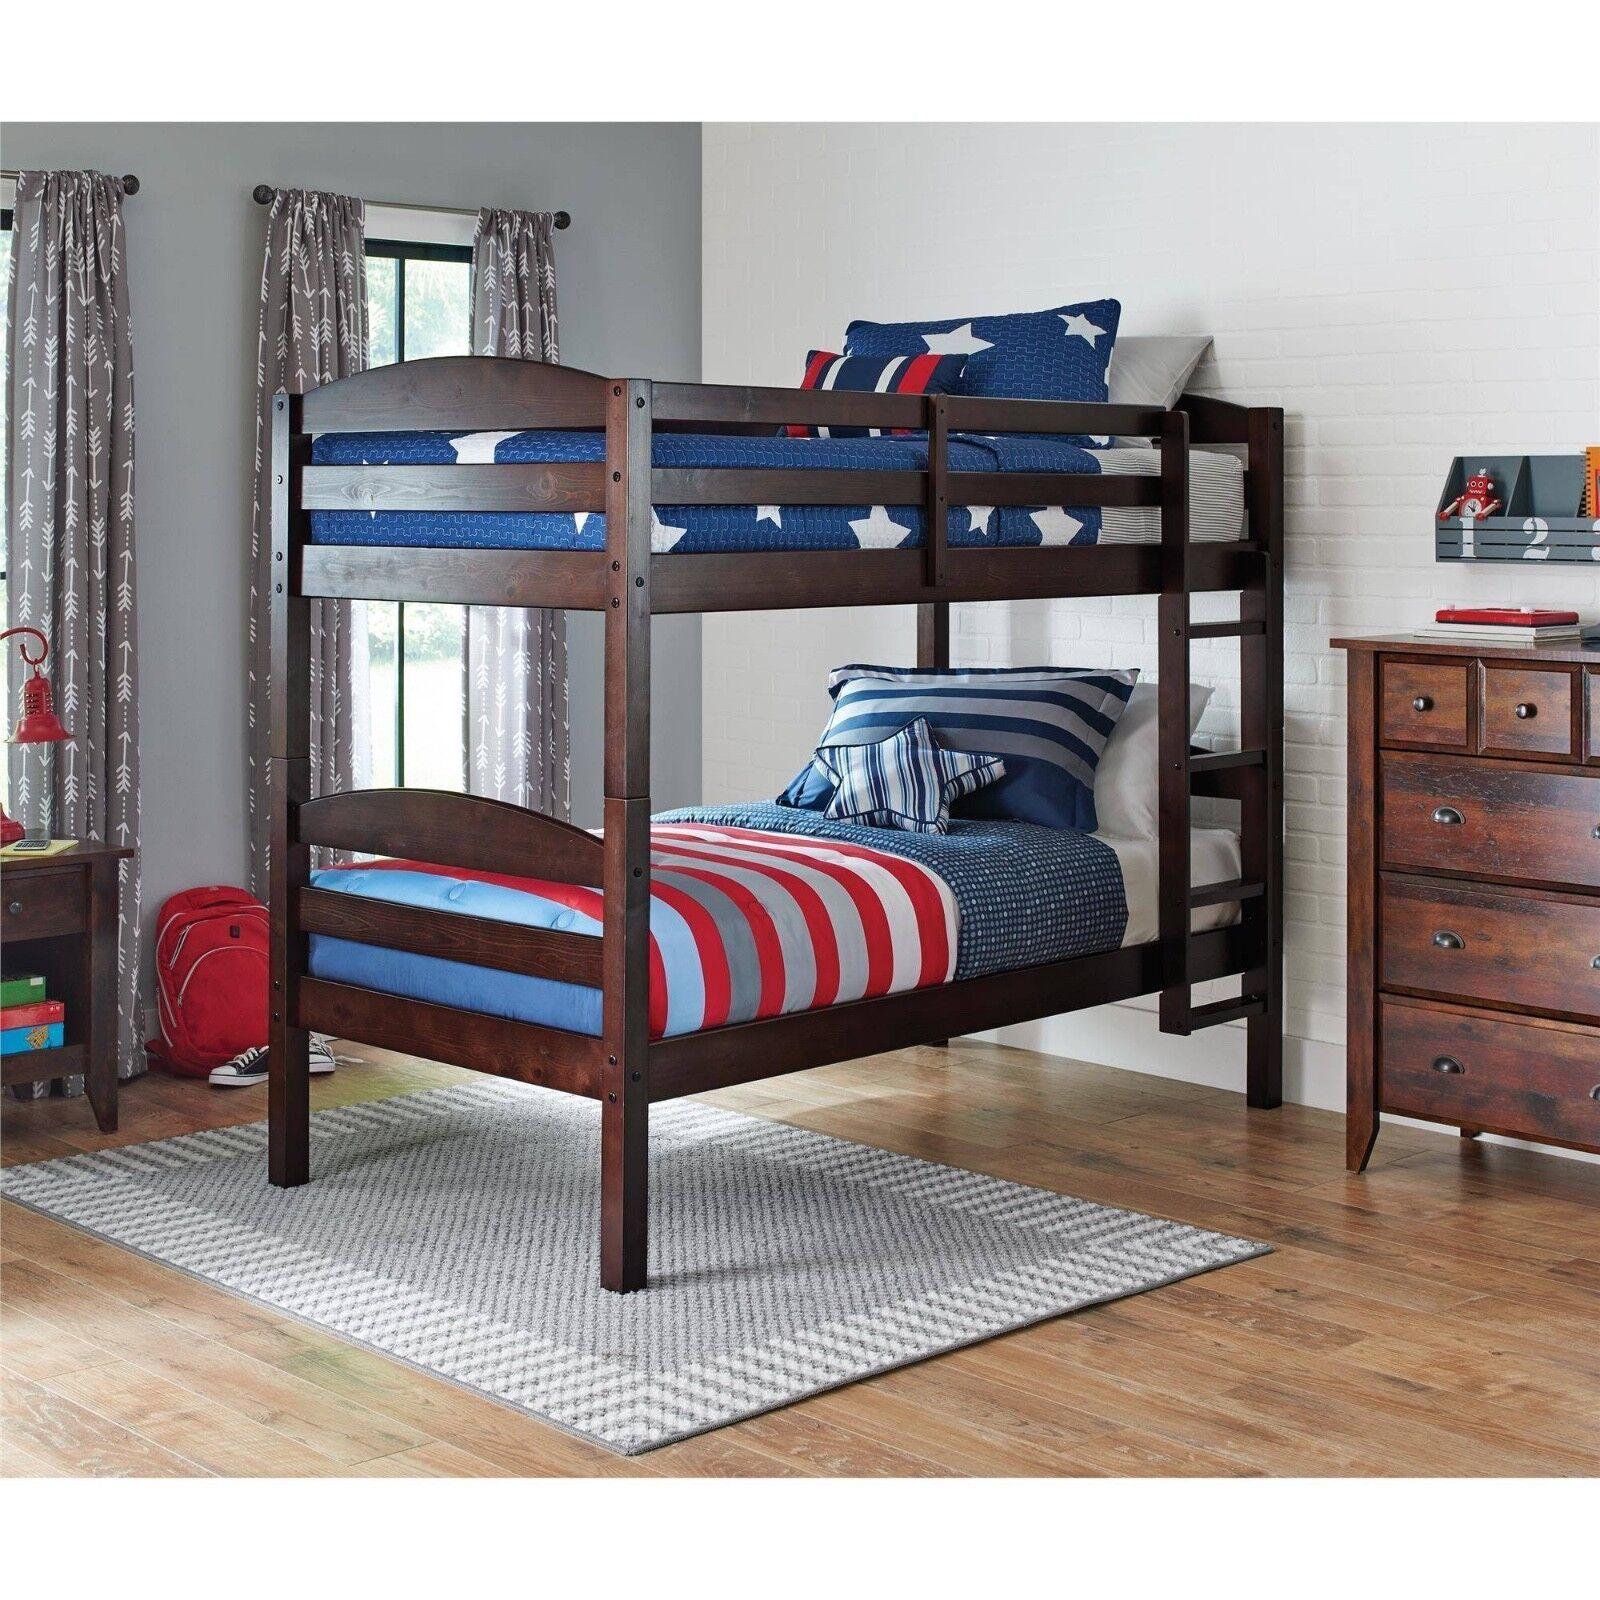 Brand NEW! BEST DEALkids Twin over Twin Bunk Beds w/Ladd